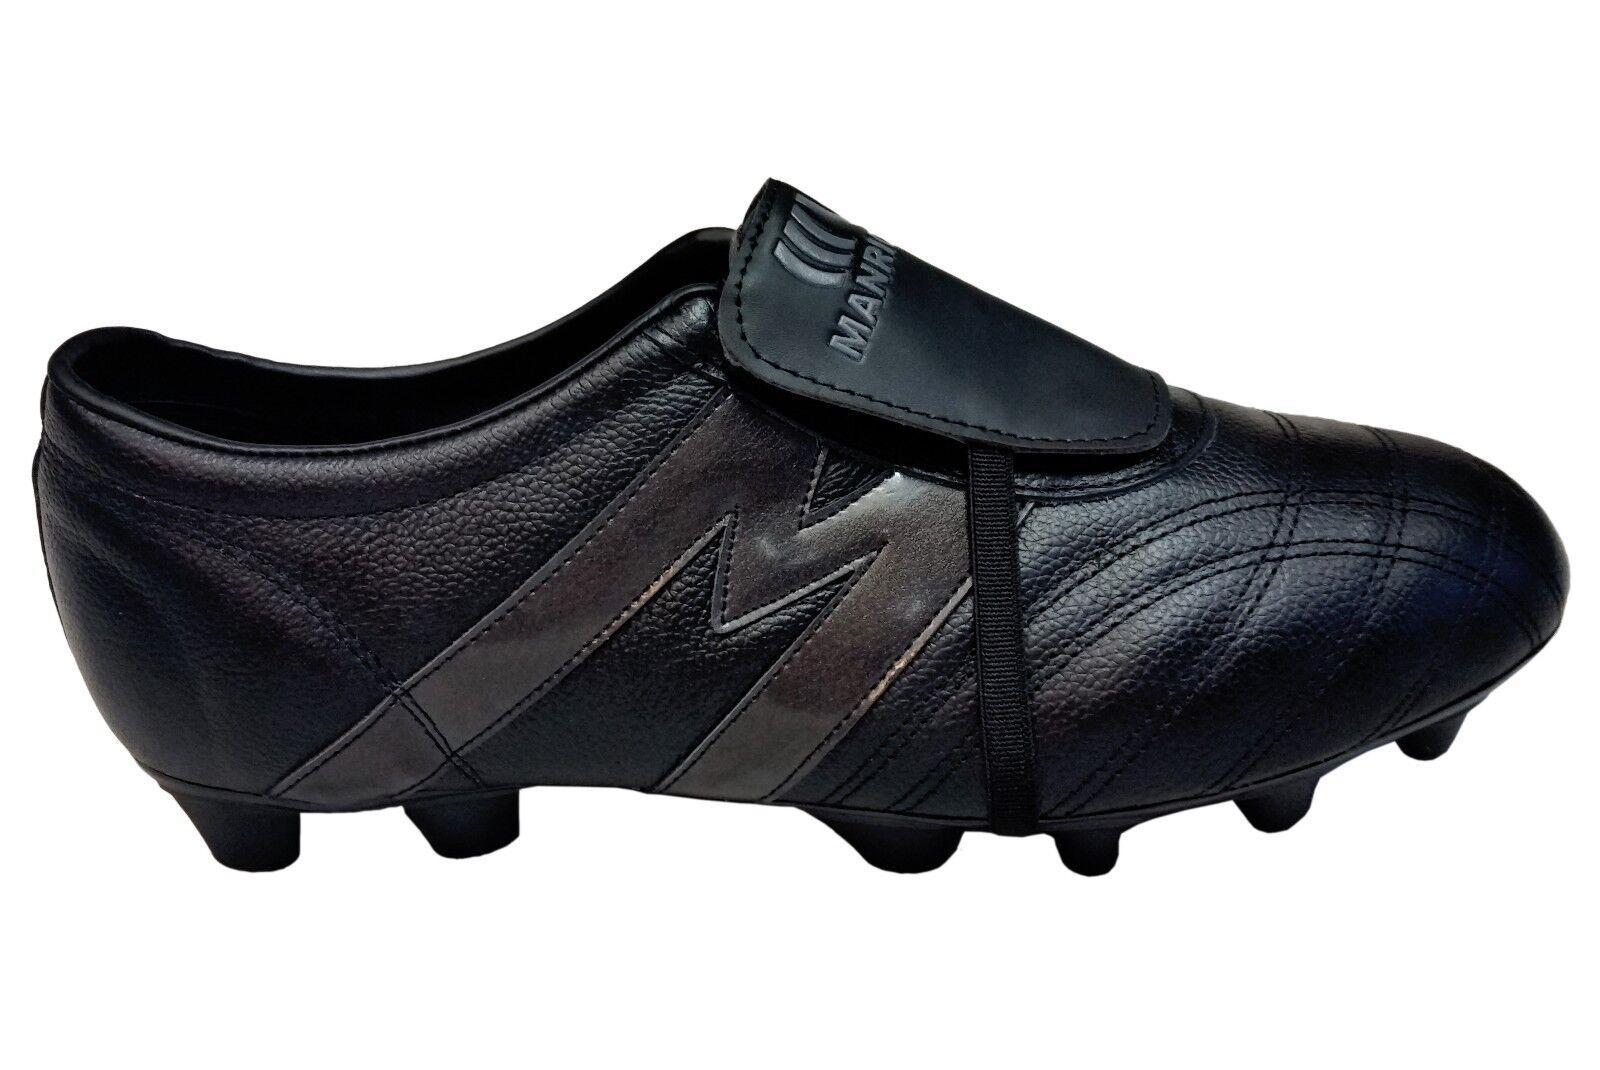 Botines de fútbol Manriquez Mid Sx total de Cuero Genuino Negro